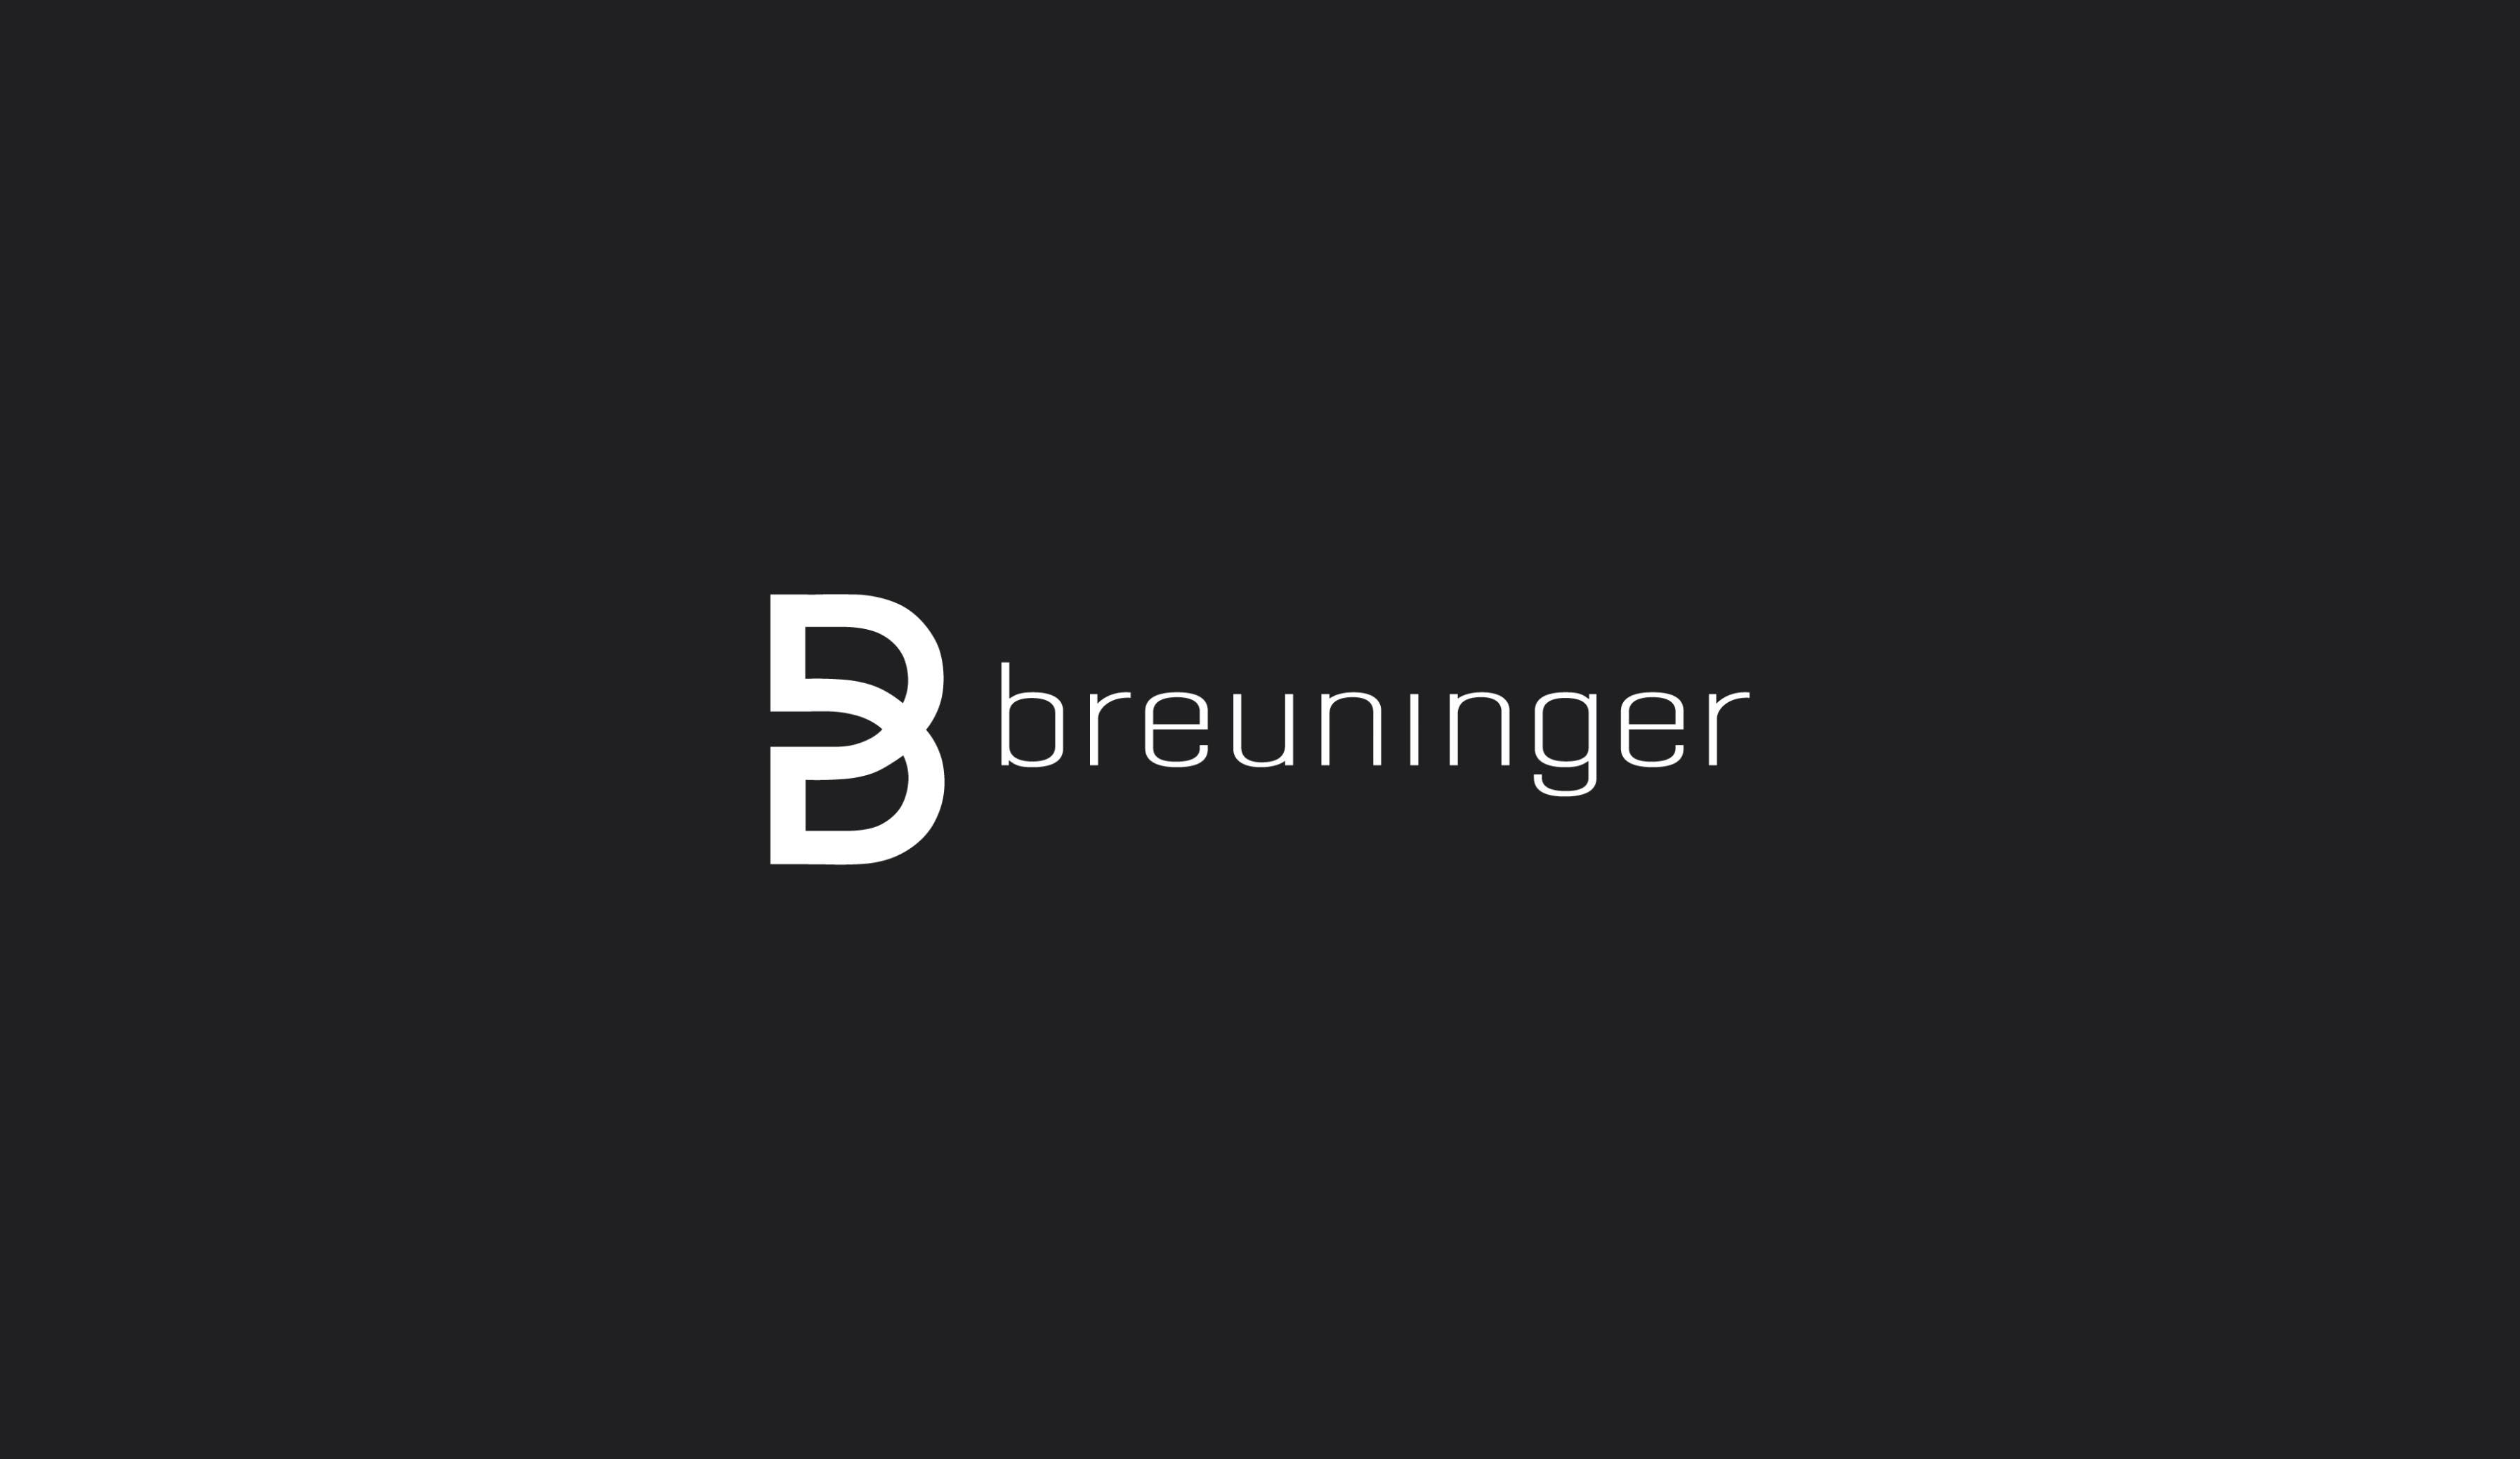 Breuninger department store logo design